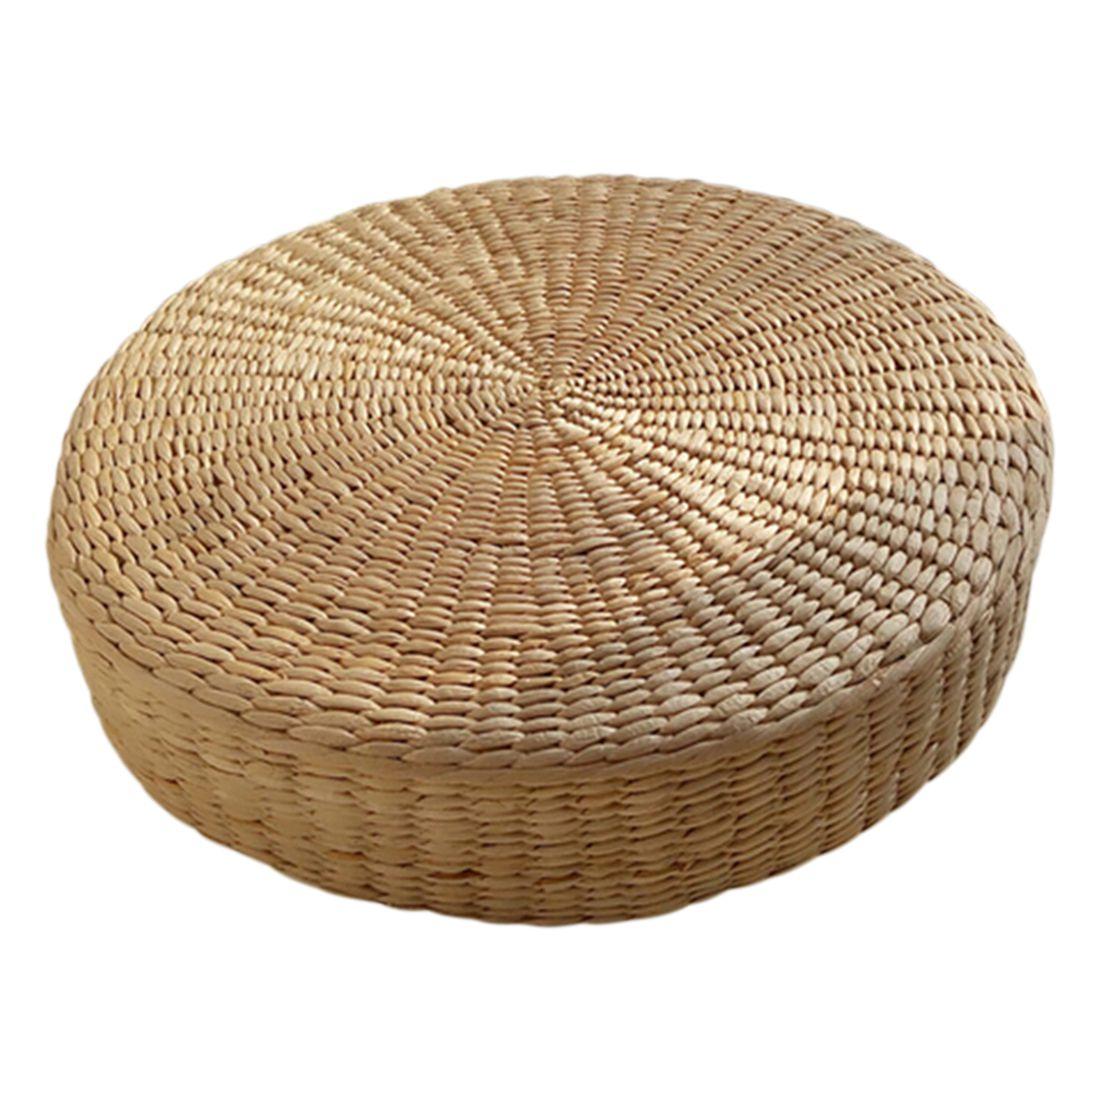 Venta caliente 40 cm Tatami cojín redondo paja tejido hecho a mano almohada piso Yoga silla Mat